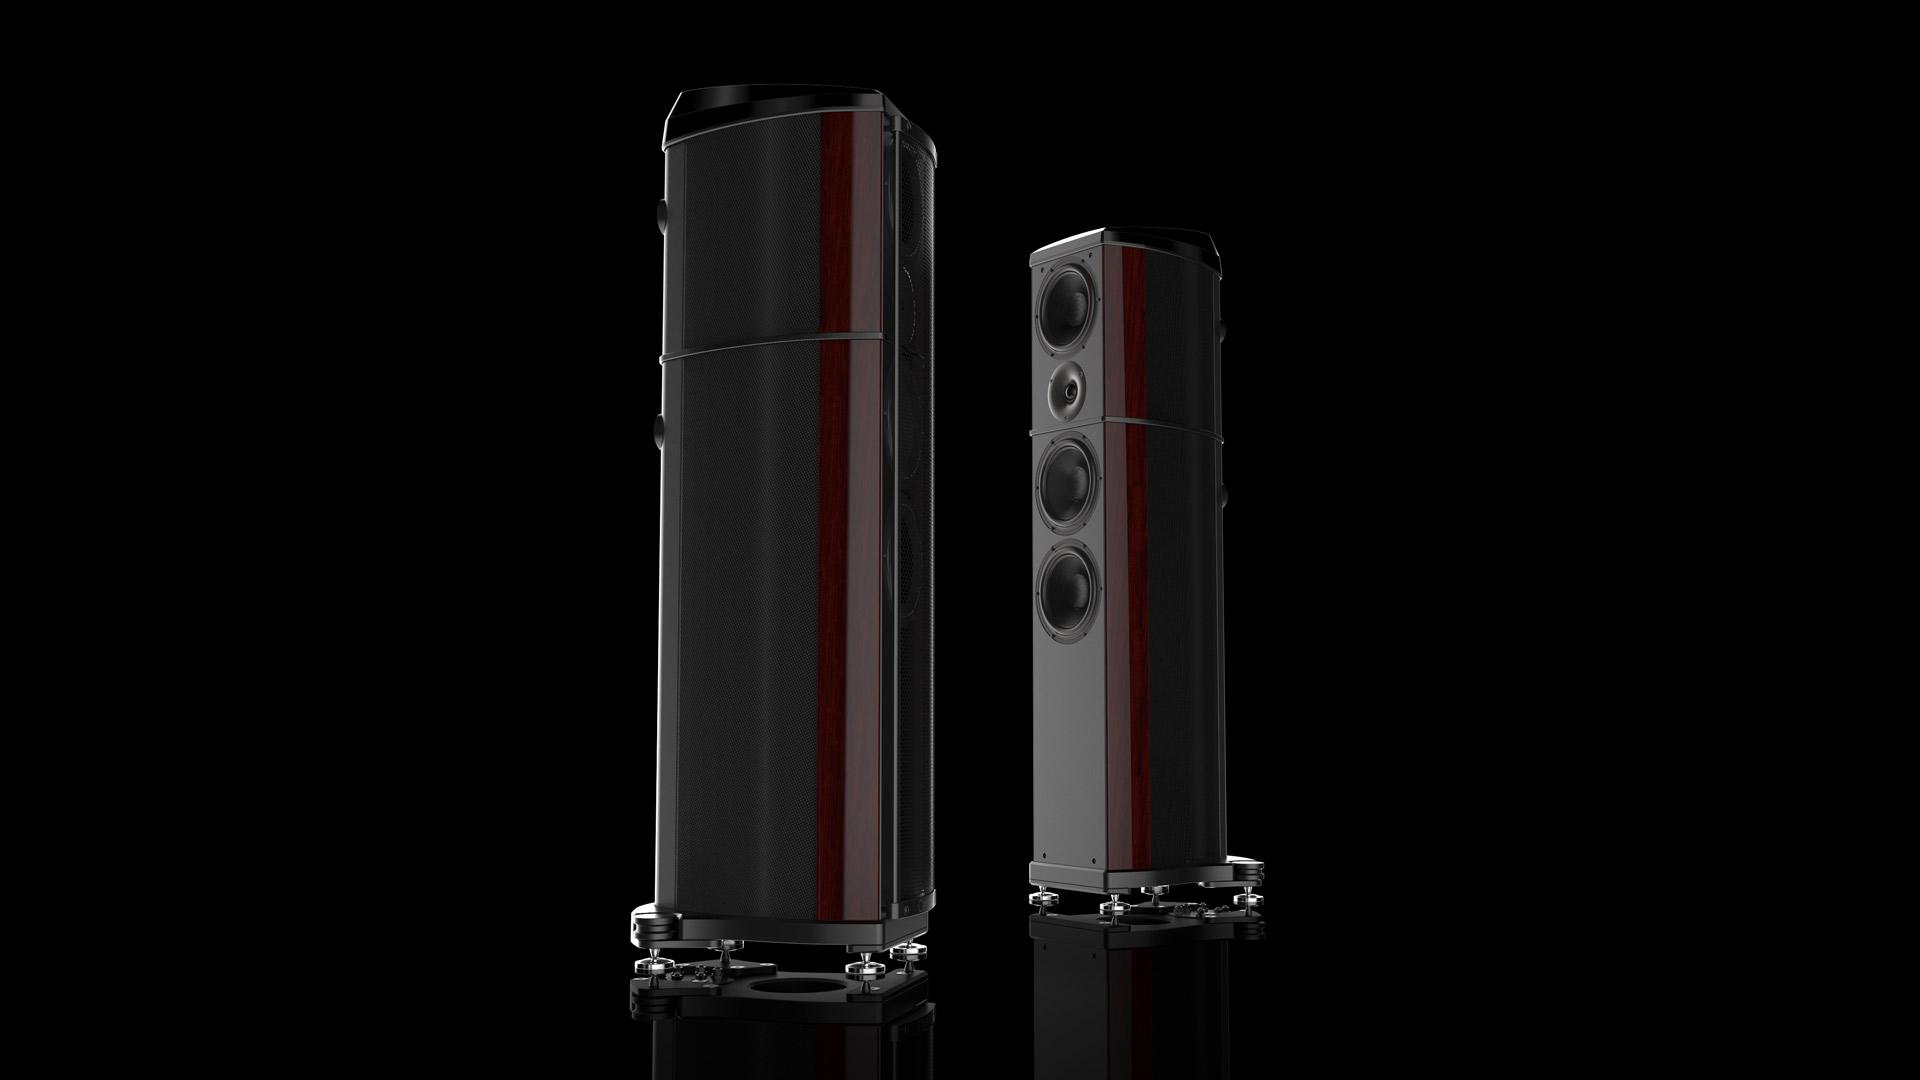 Wilson-Benesch-Geometry-Series-A.C.T.-One-Evolution-floorstanding-loudspeaker-singularity-audio-1